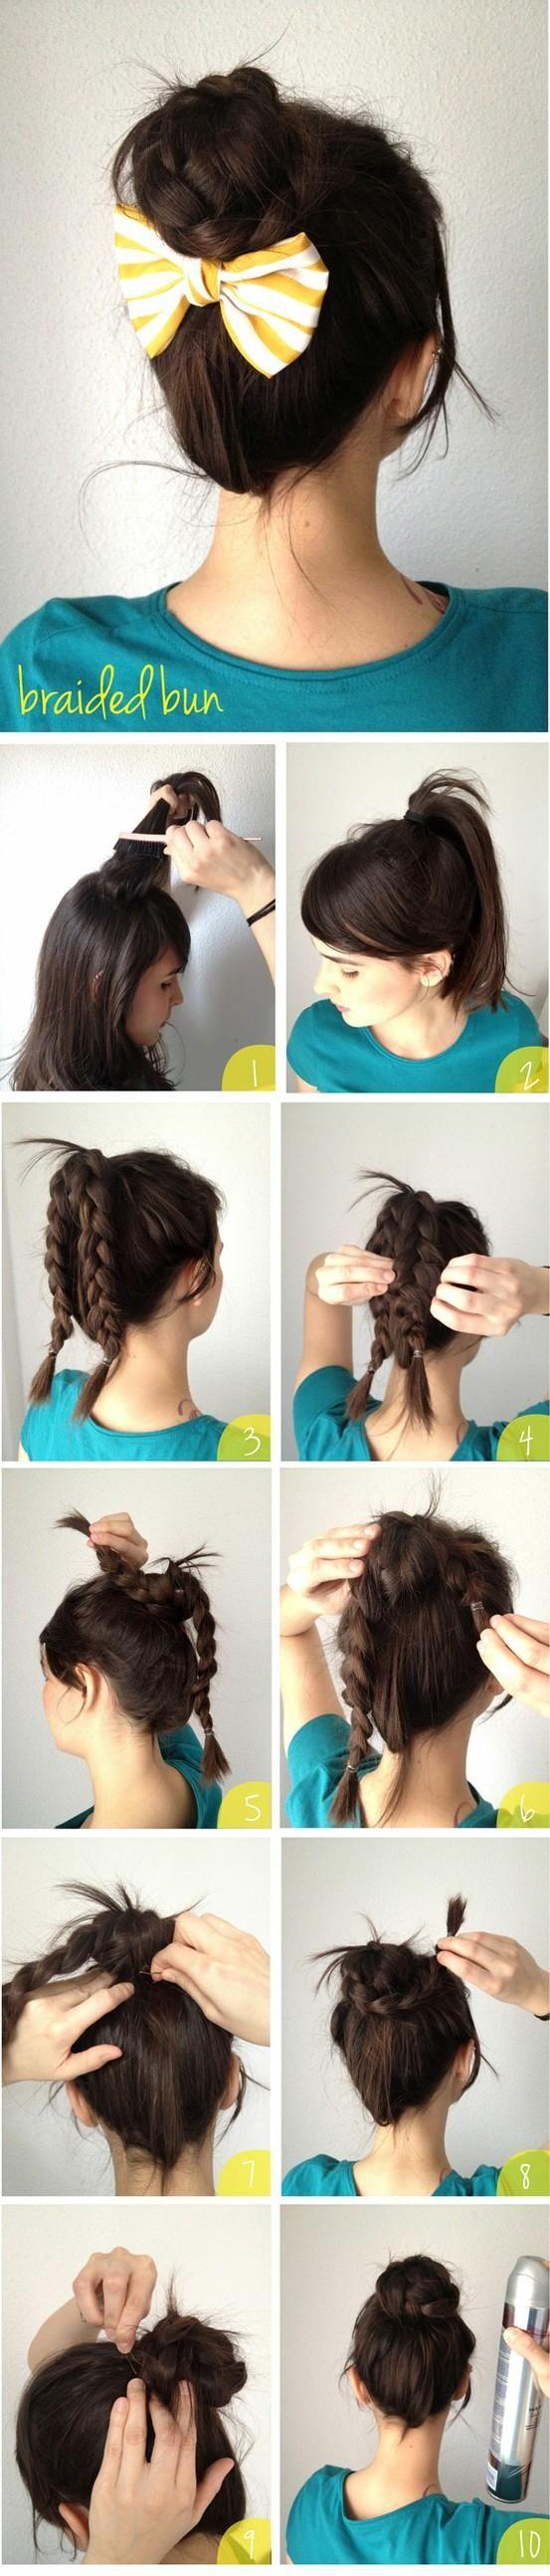 how to braided bun